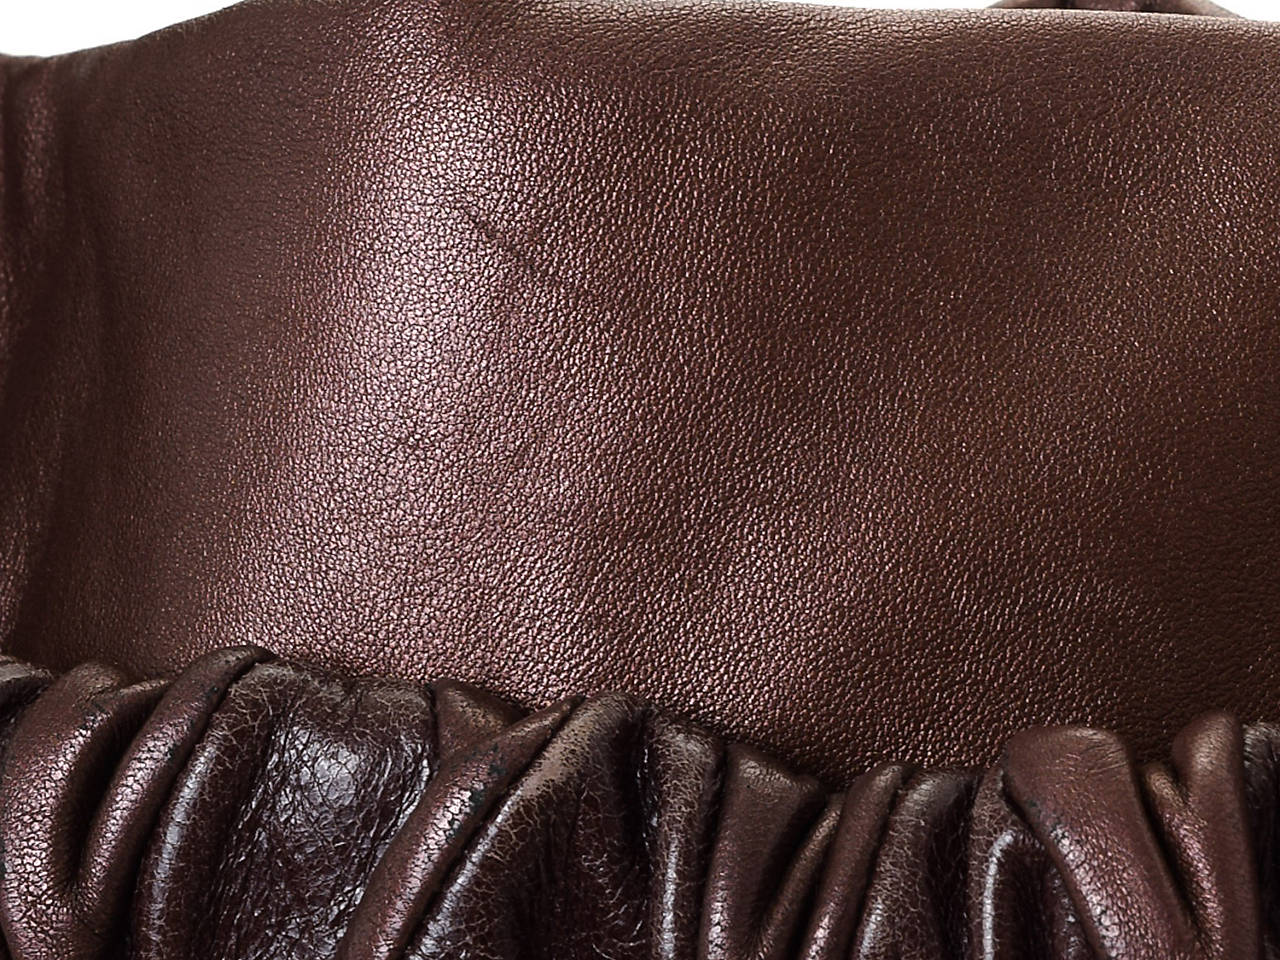 Miu Miu - Vintage Luxury Harlequin Two Way Leather Shoulder Bag ... b534416244c9b